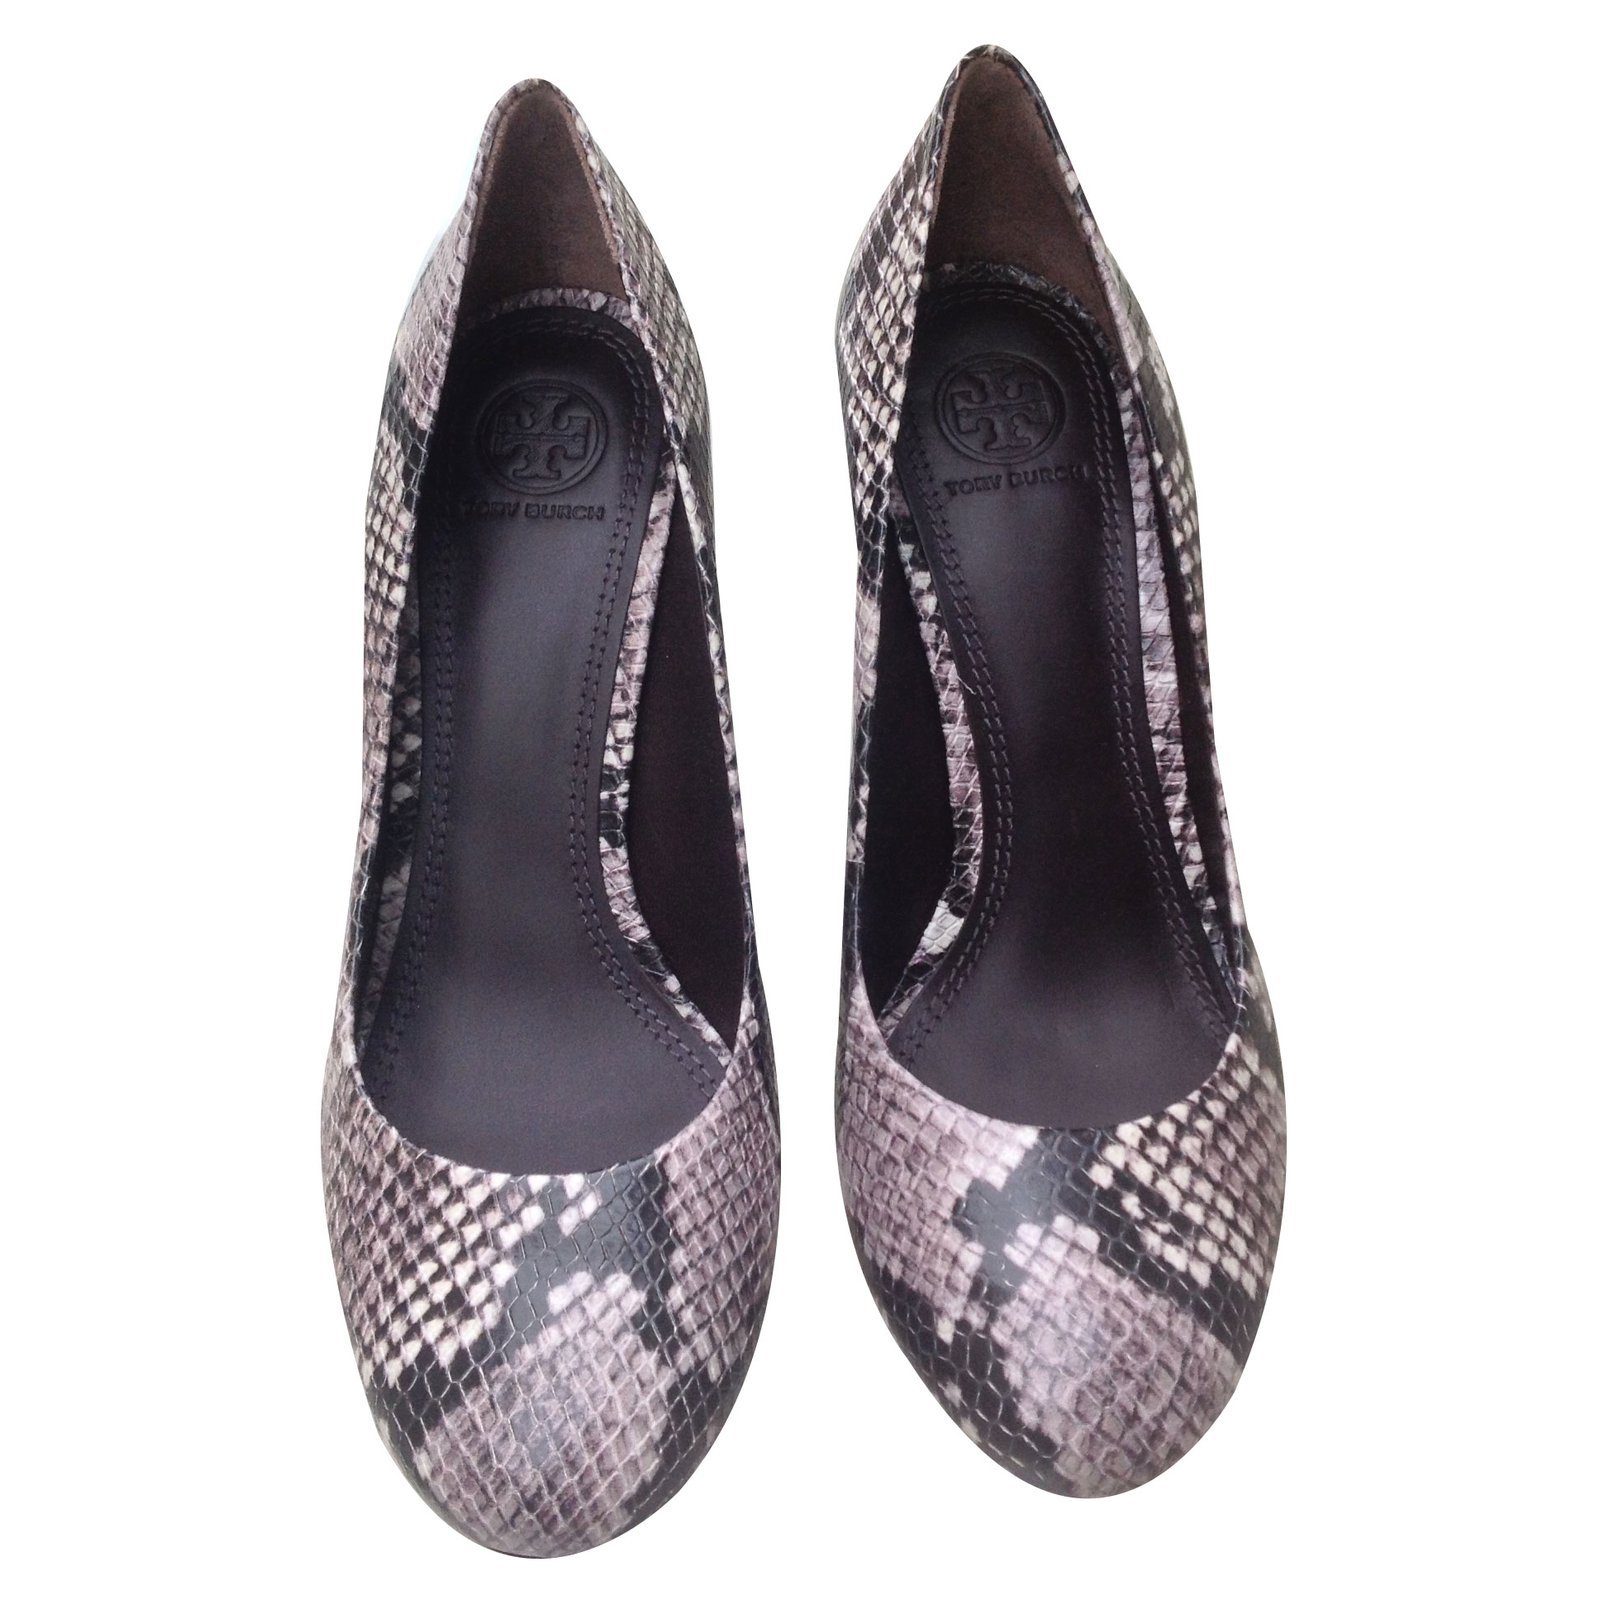 659afe80248 Tory Burch Pumps Heels Leather Multiple colors ref.46093 - Joli Closet